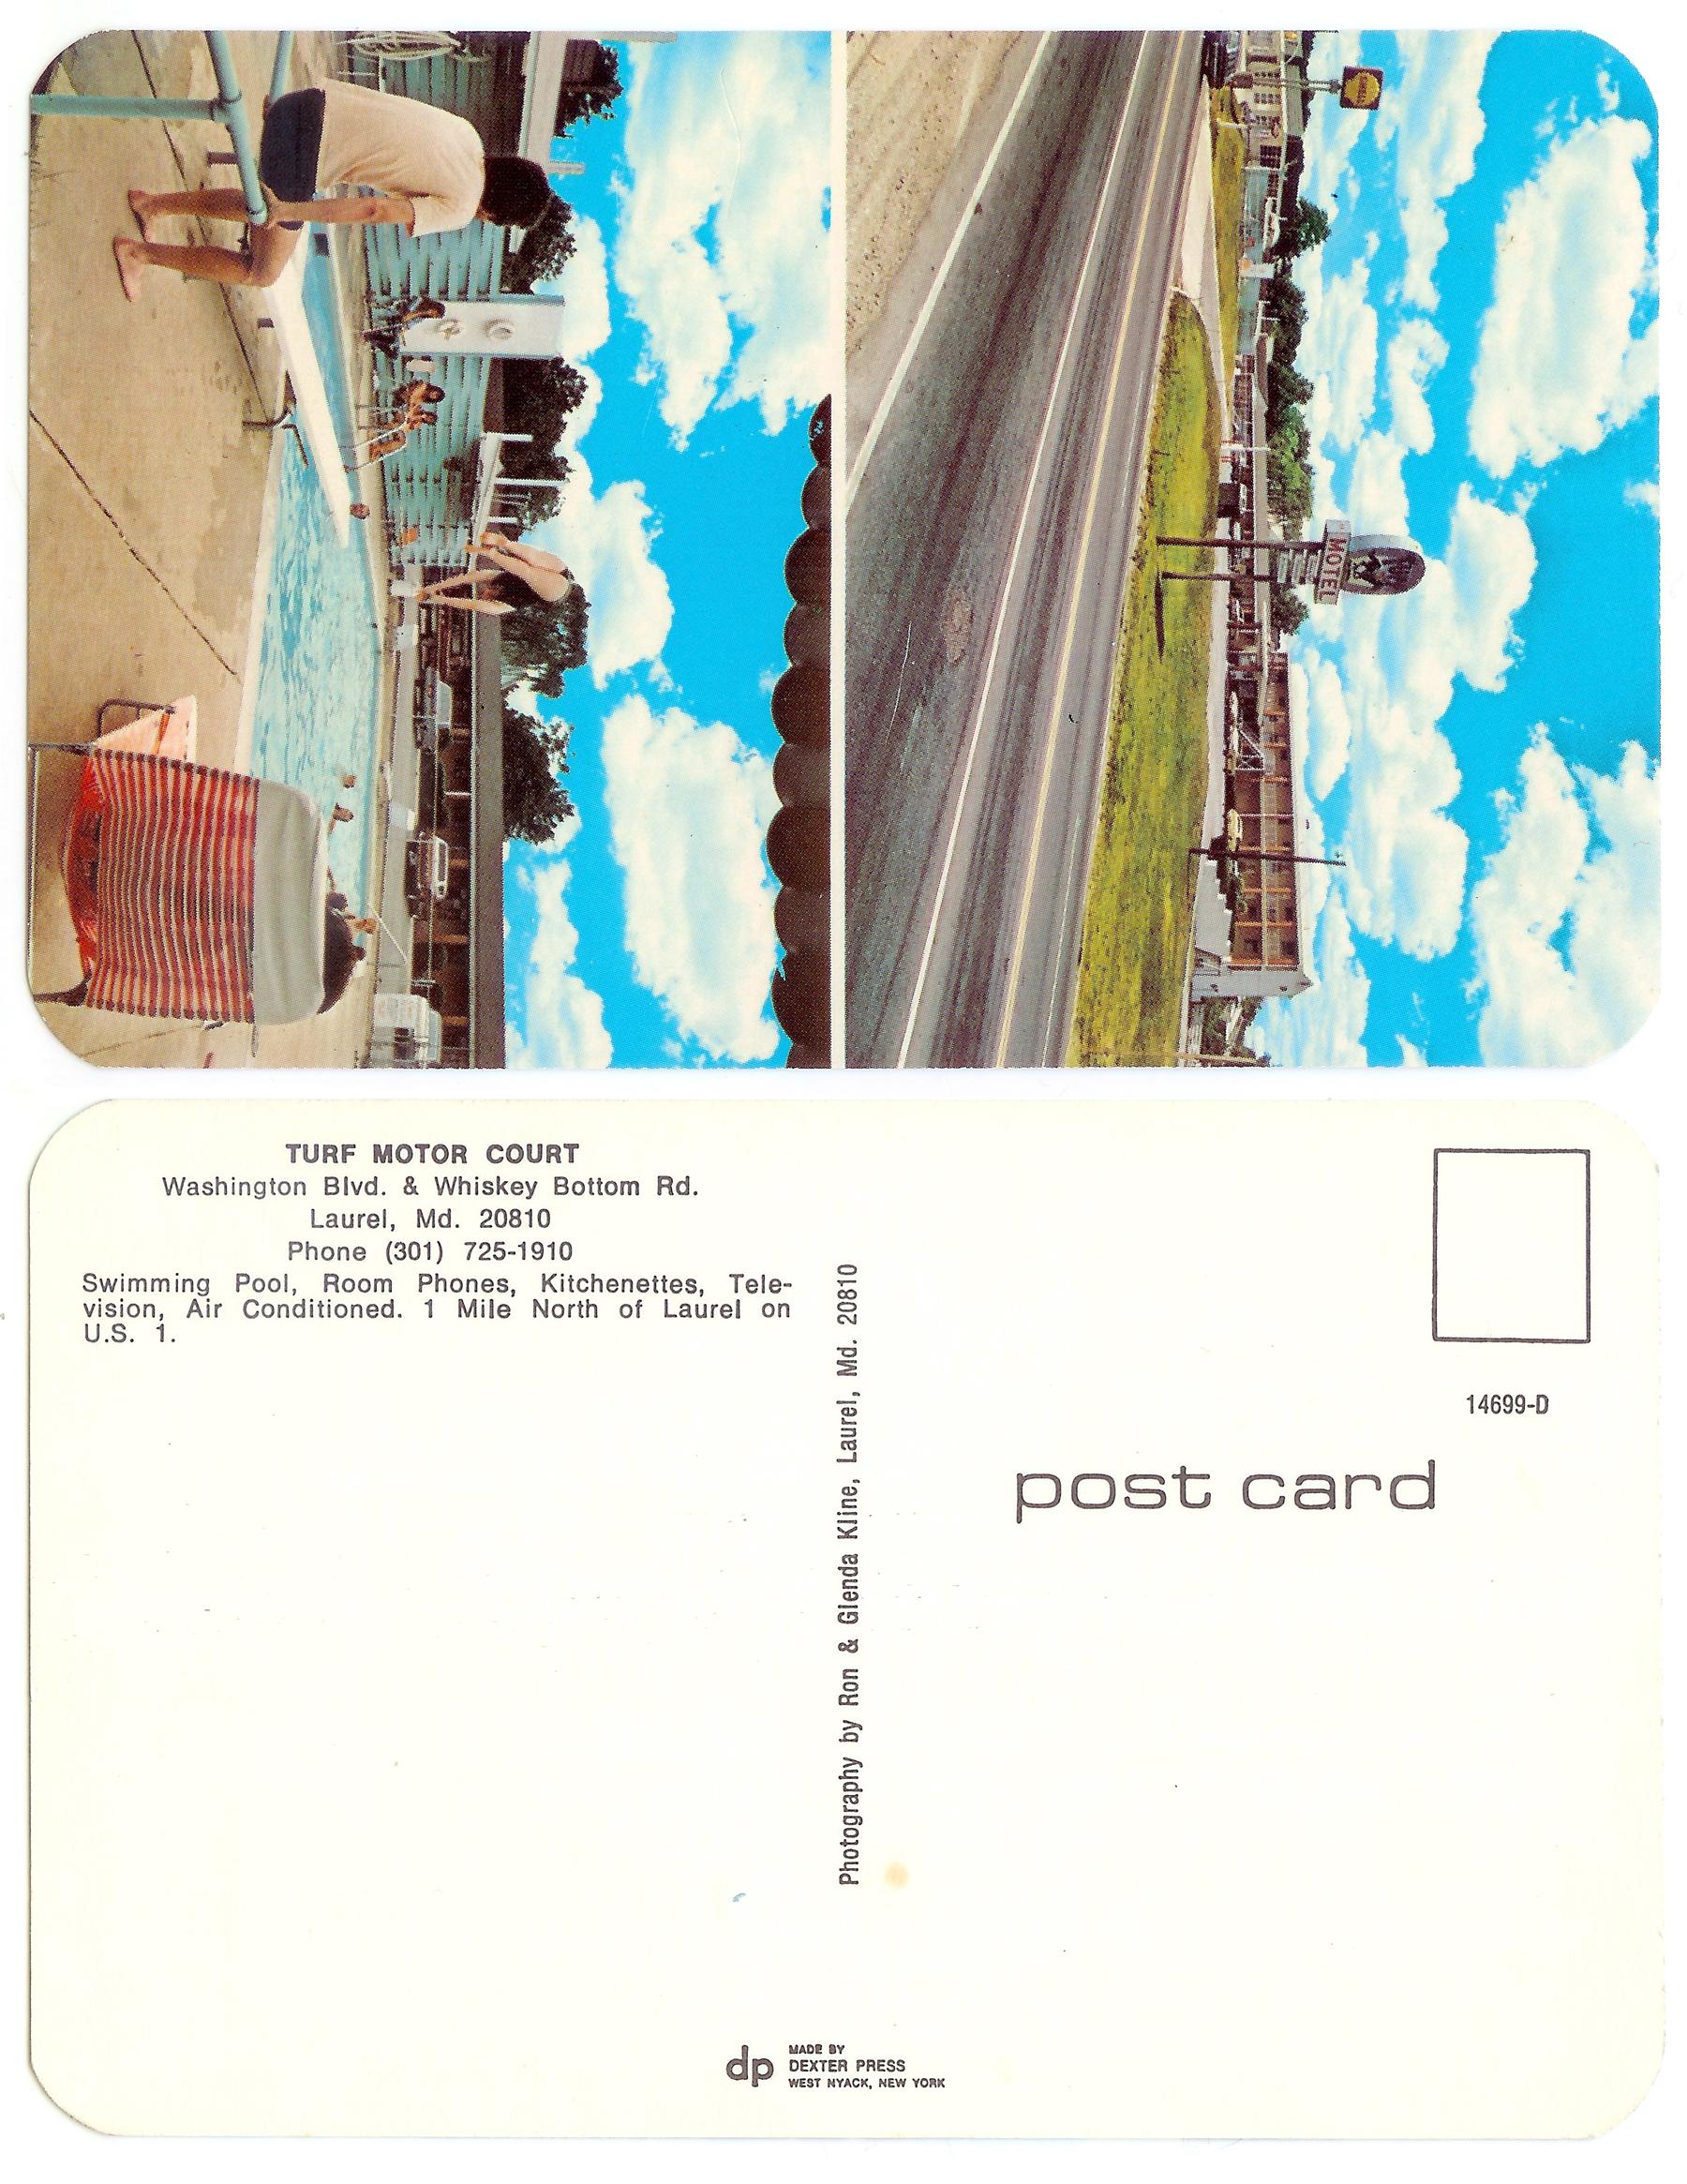 POSTCARDS-63